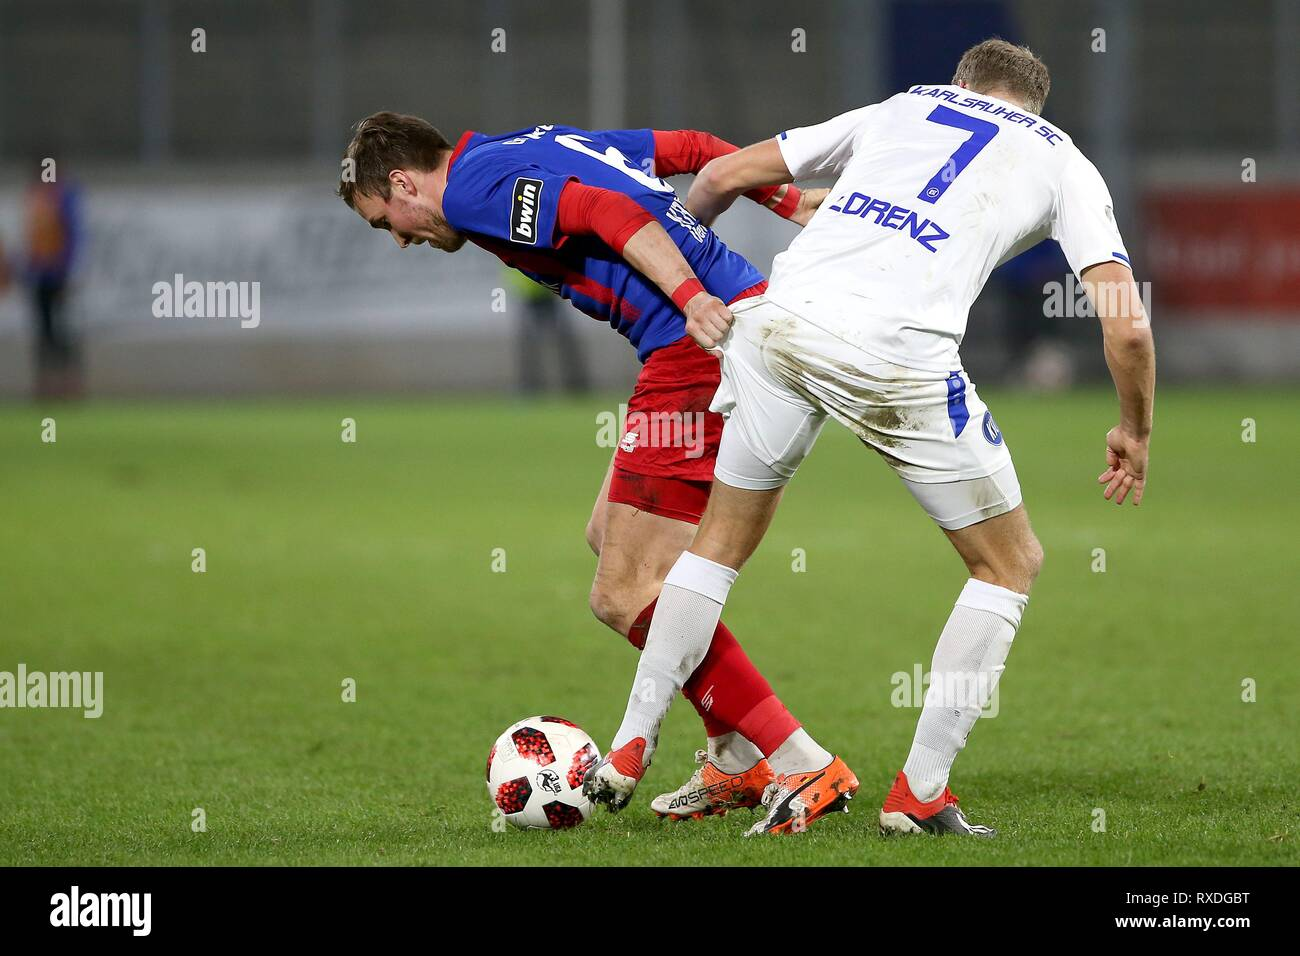 firo: 08.03.2019 Football, 3. Bundesliga, season 2018/2019 KFC Uerdingen 05 - Karlsruher SC Kevin Grovukreutz (# 6, KFC Uerdingen 05) in duels with Marc Lorenz (# 7, Karlsruher SC) | usage worldwide - Stock Image